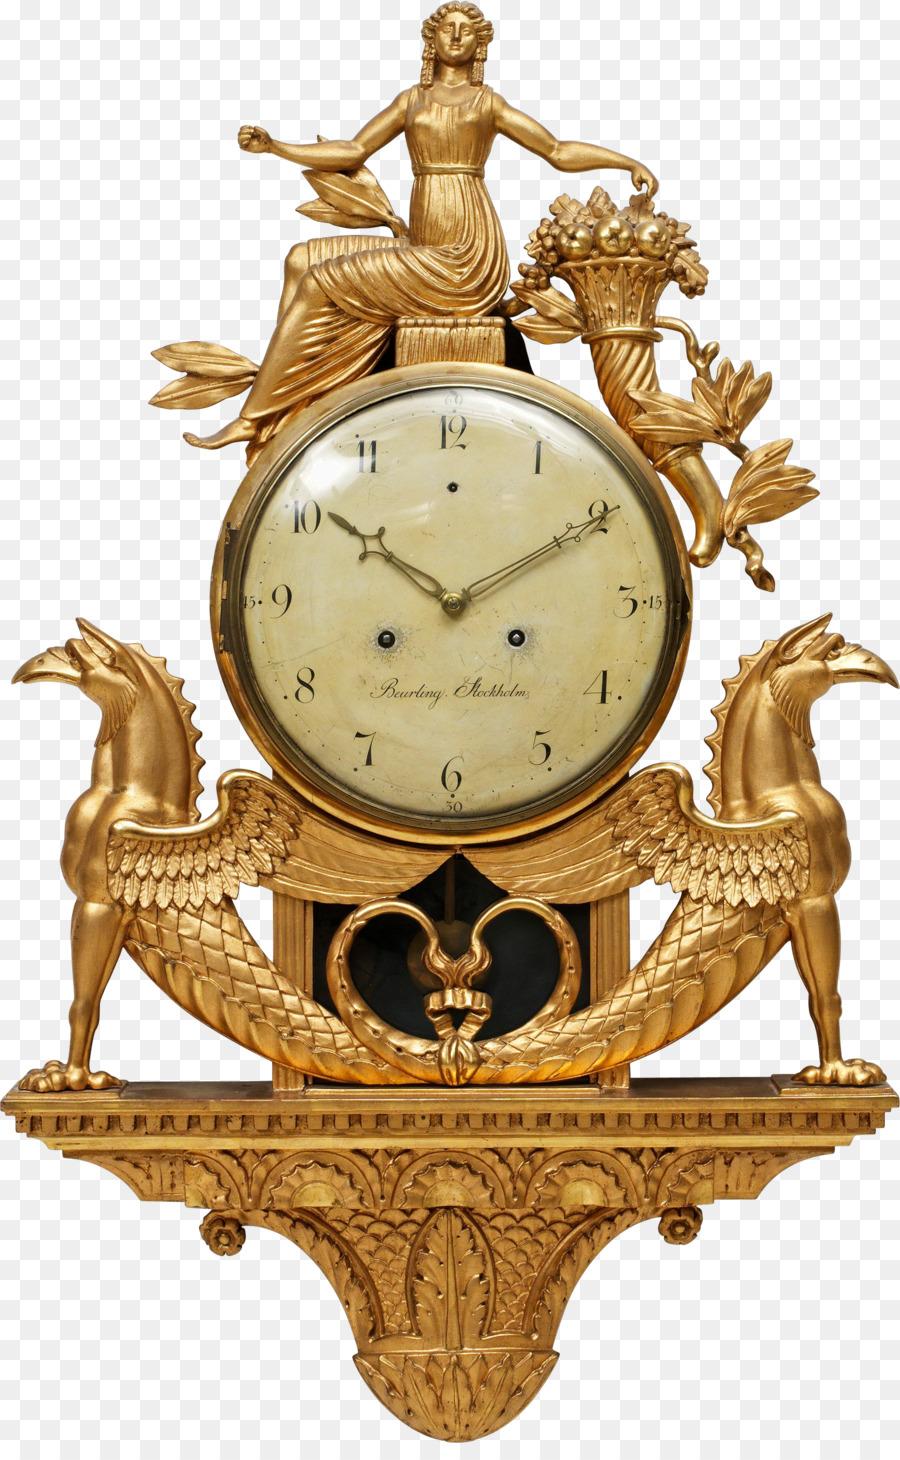 Cuckoo clock Clock face Pendulum clock Clip art - clock png download ...